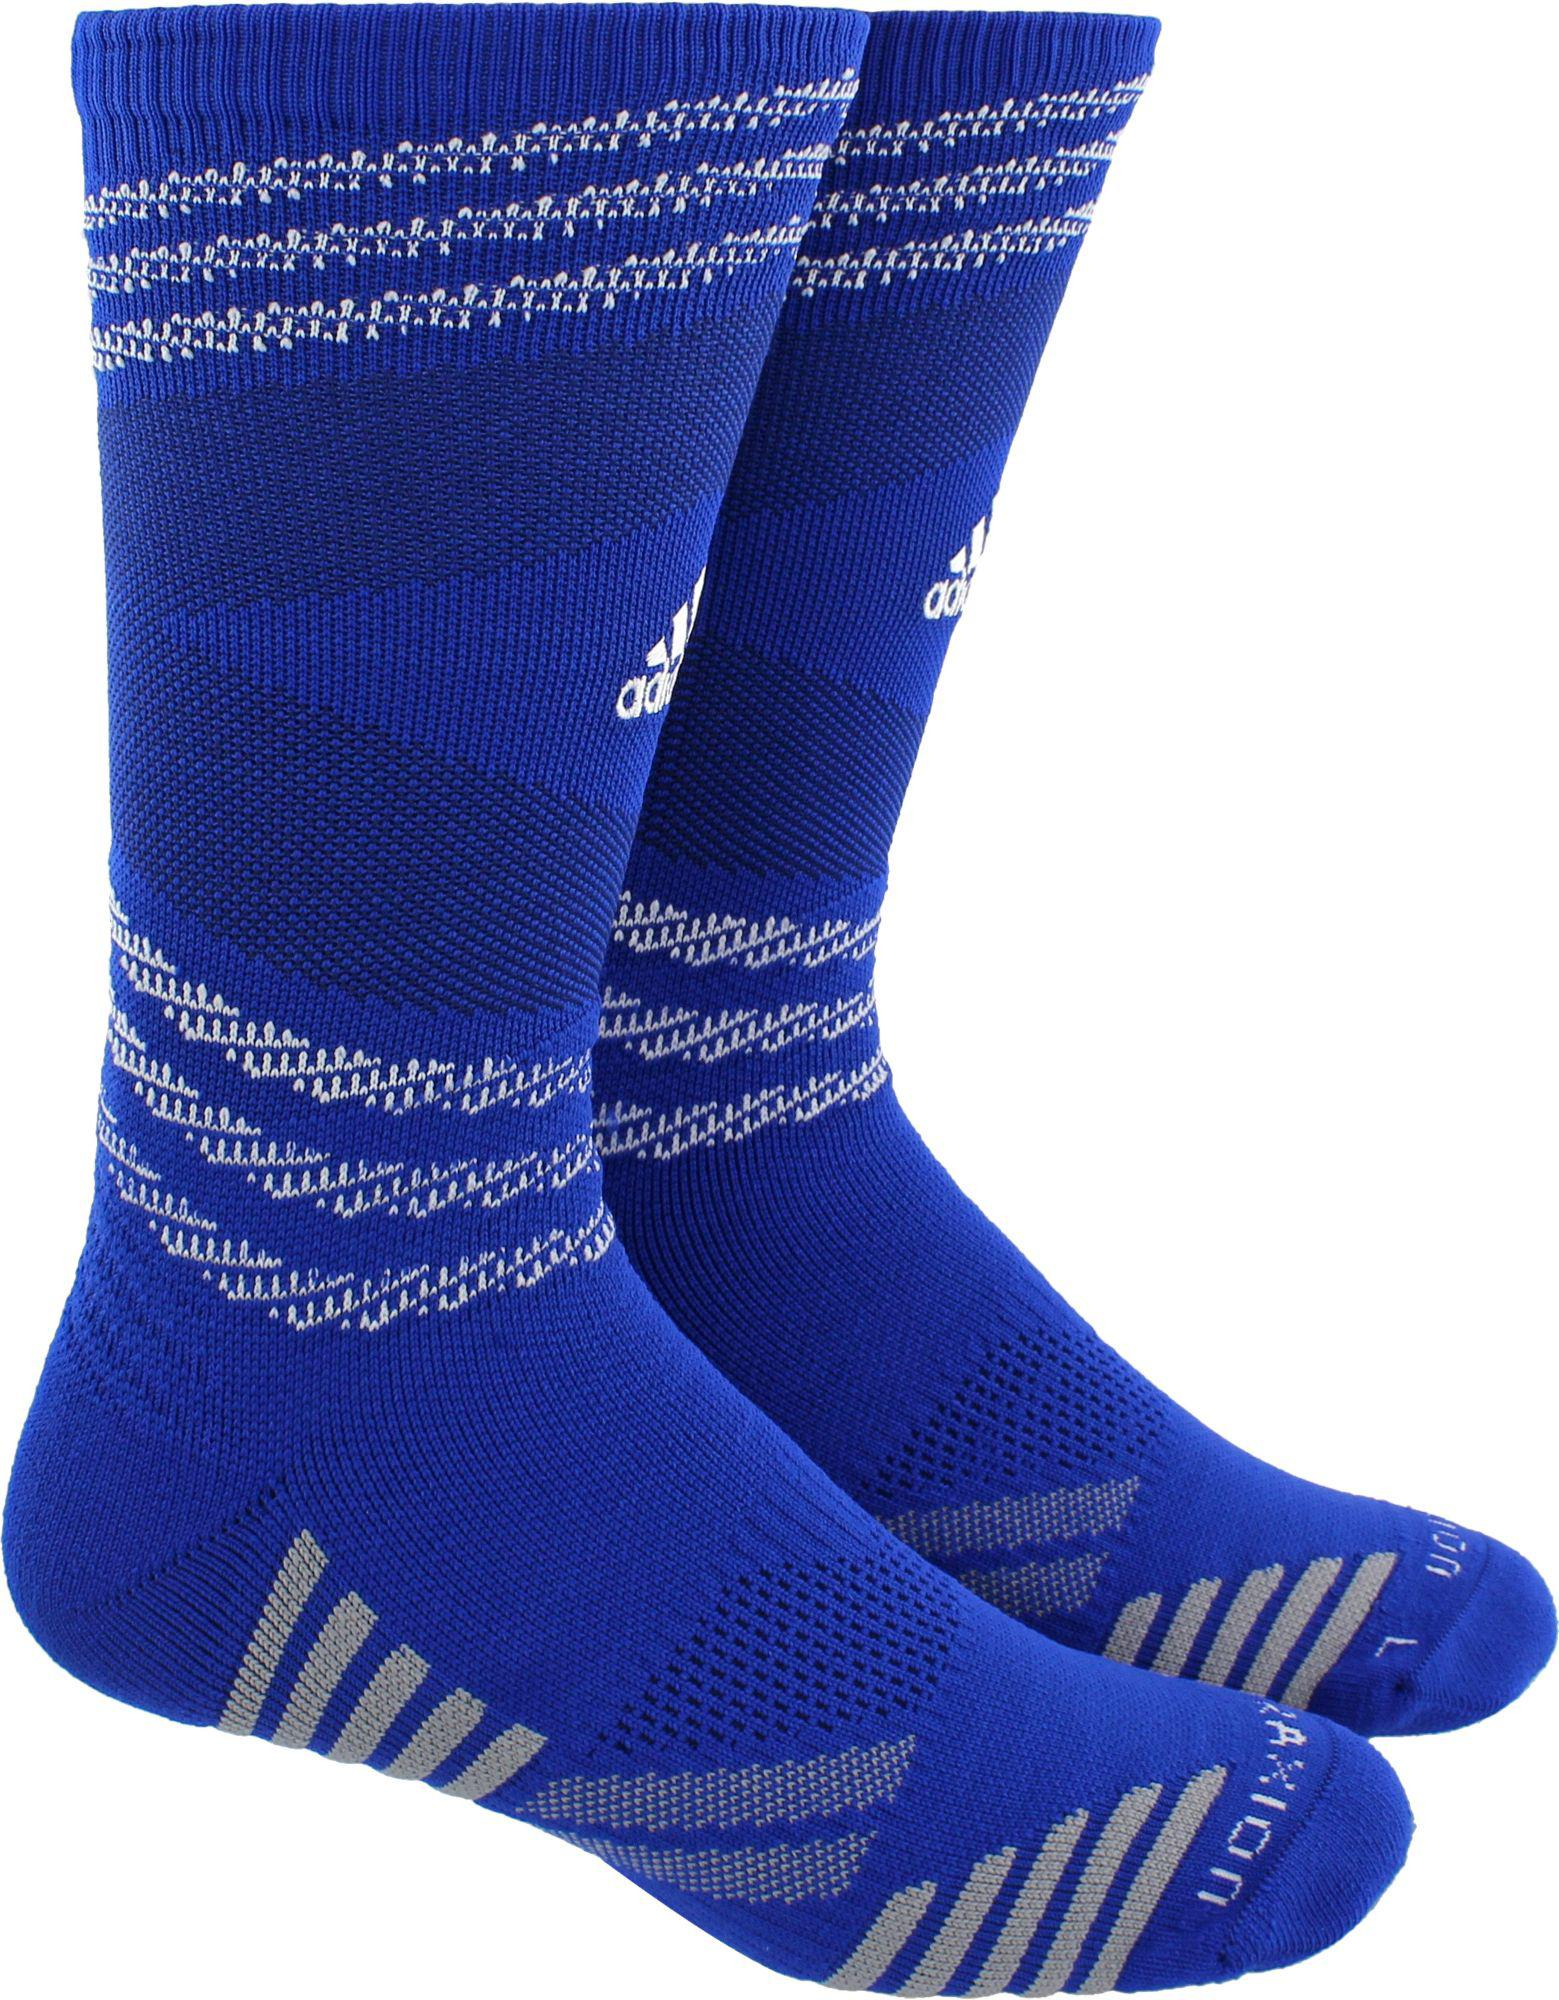 Lyst - adidas Speed Mesh Team Traxion Single Crew Socks in Blue for Men 9e5b4cf1f